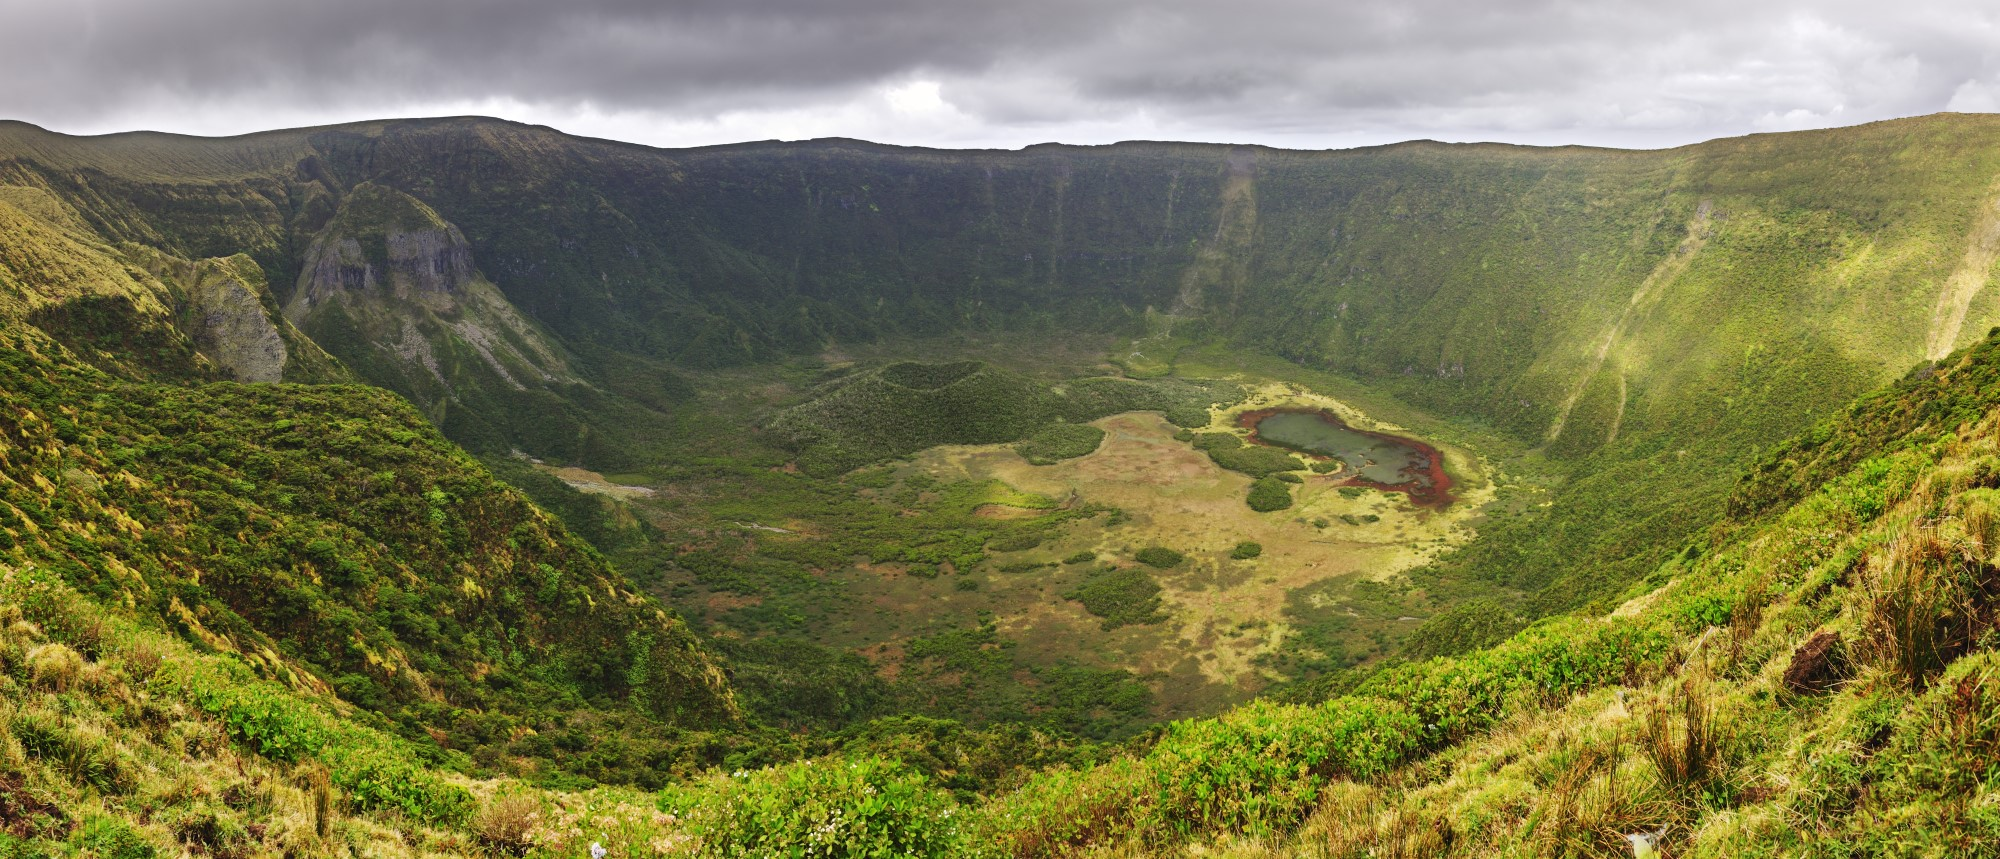 Caldeira auf Faial